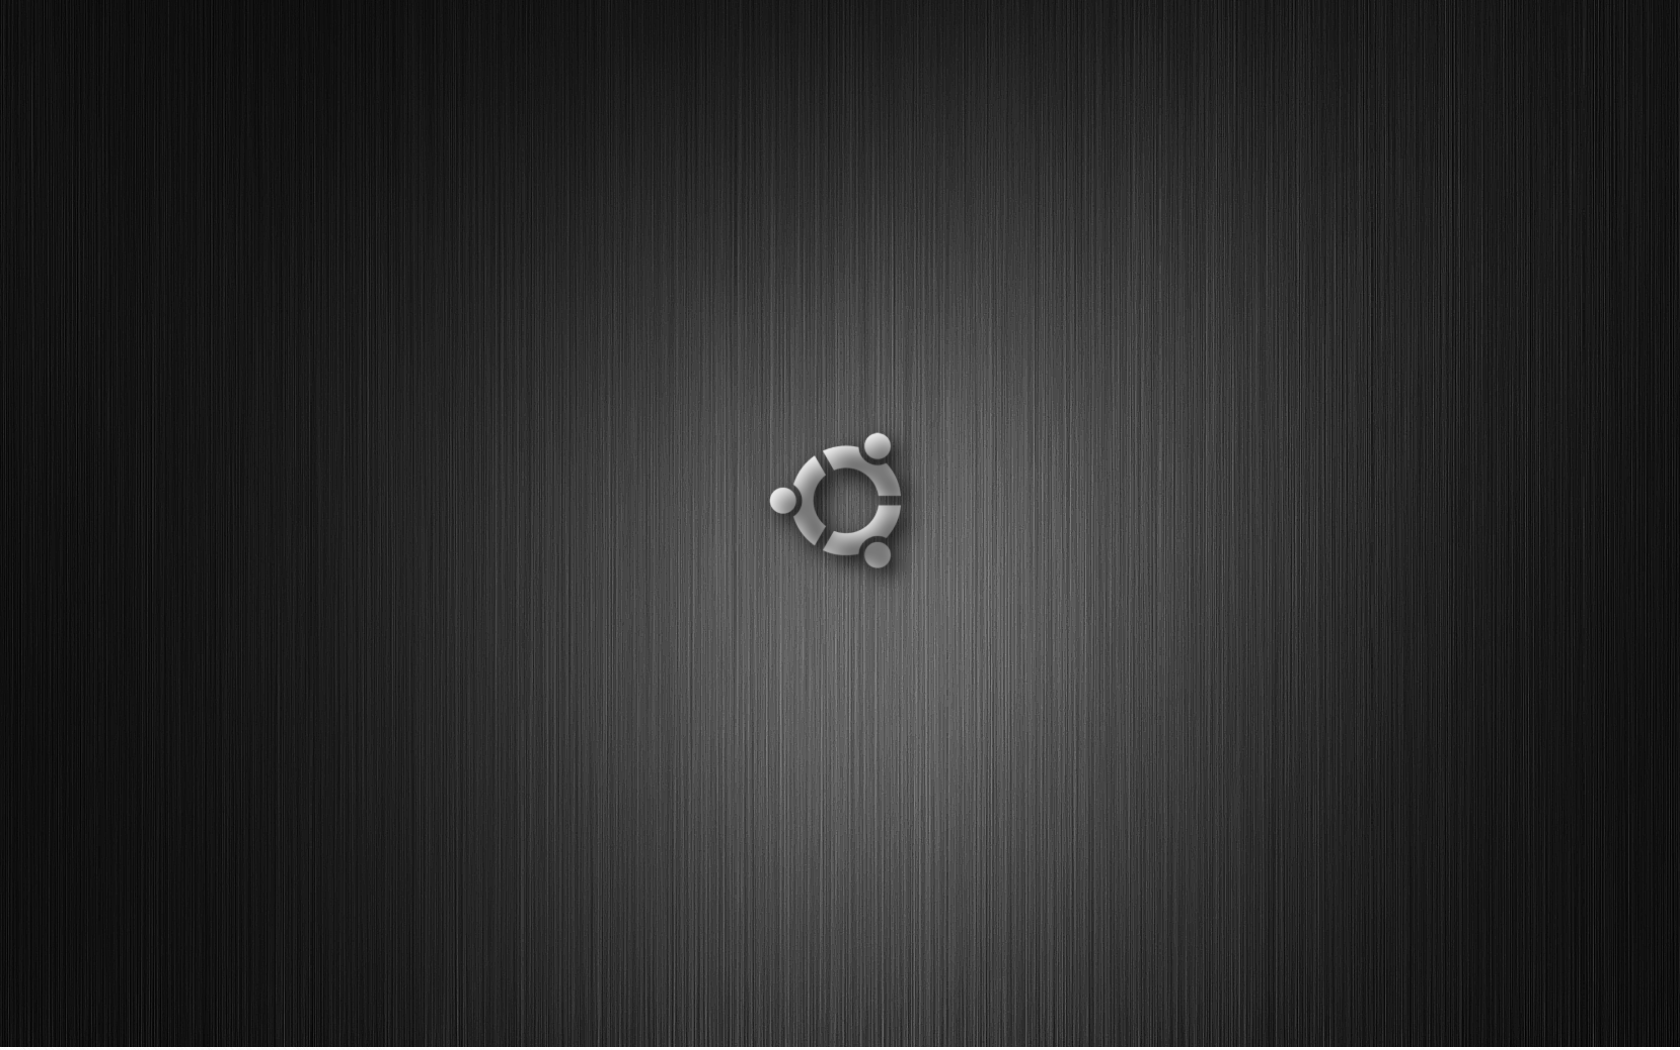 Ubuntu Wallpaper 1680x1050 Ubuntu 1680x1050